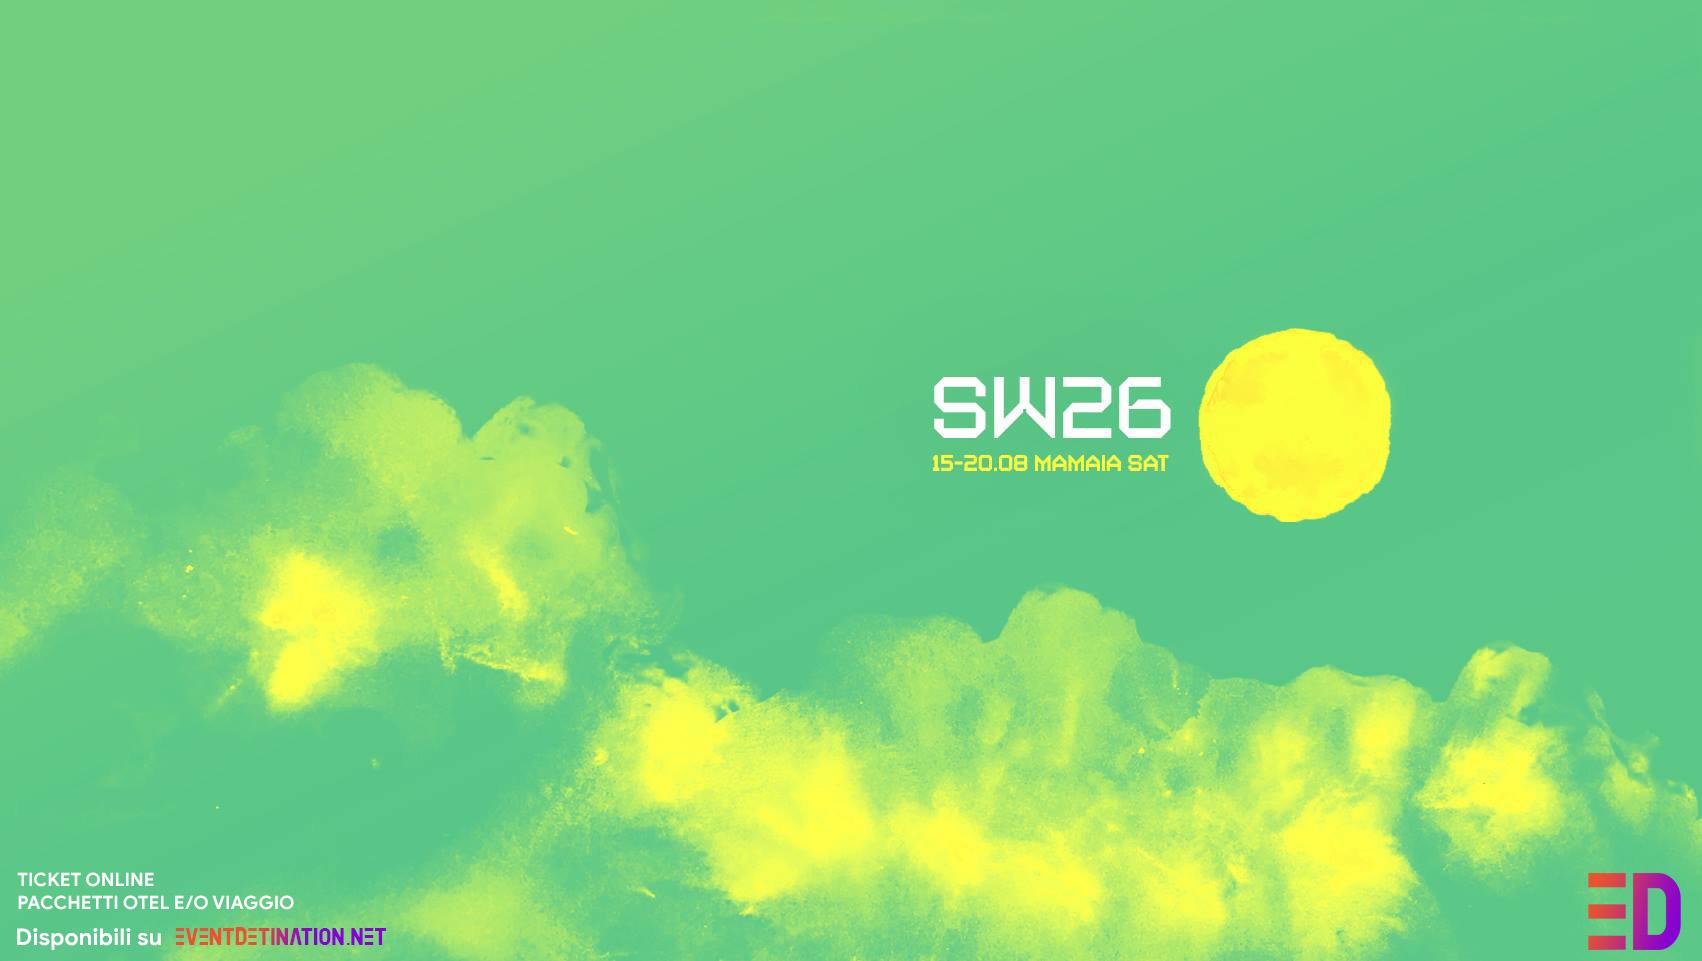 Sunwaves Festival 2019 Summer edition Mamaia – SW26 Romania – Ticket e Pacchetti Hotel